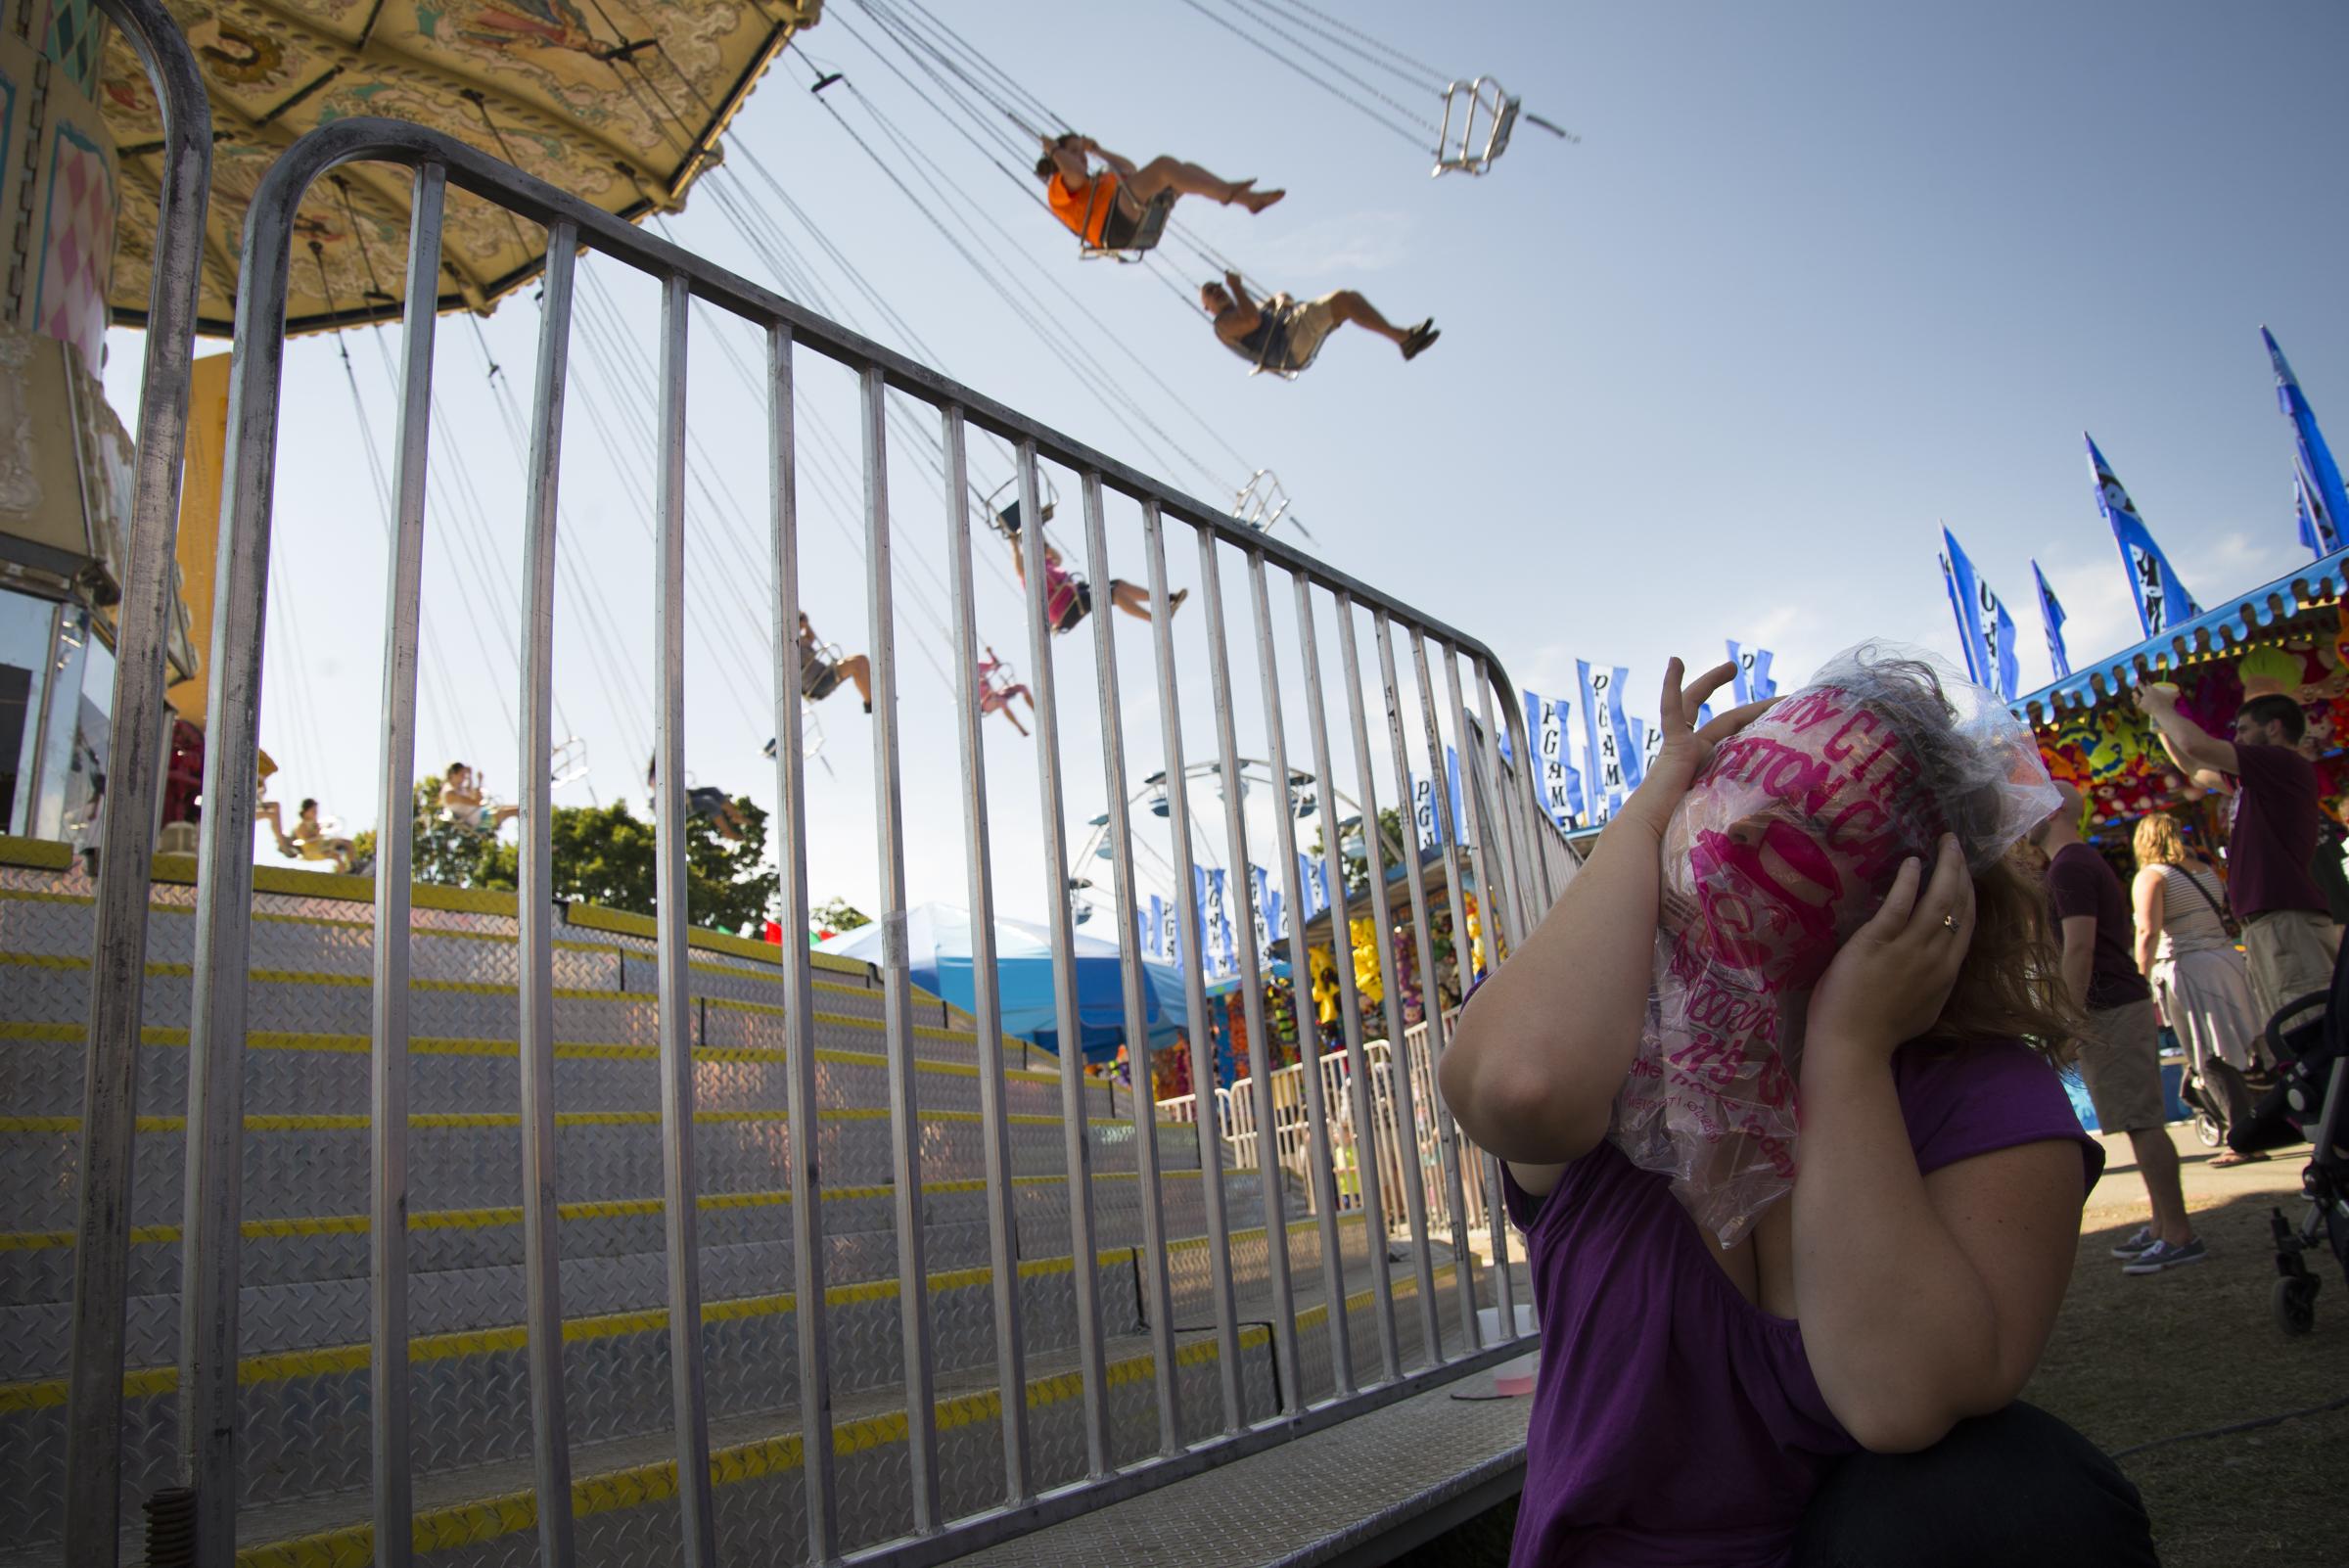 08252013-CarnivalScene-JuliaLuckettPhotography-9